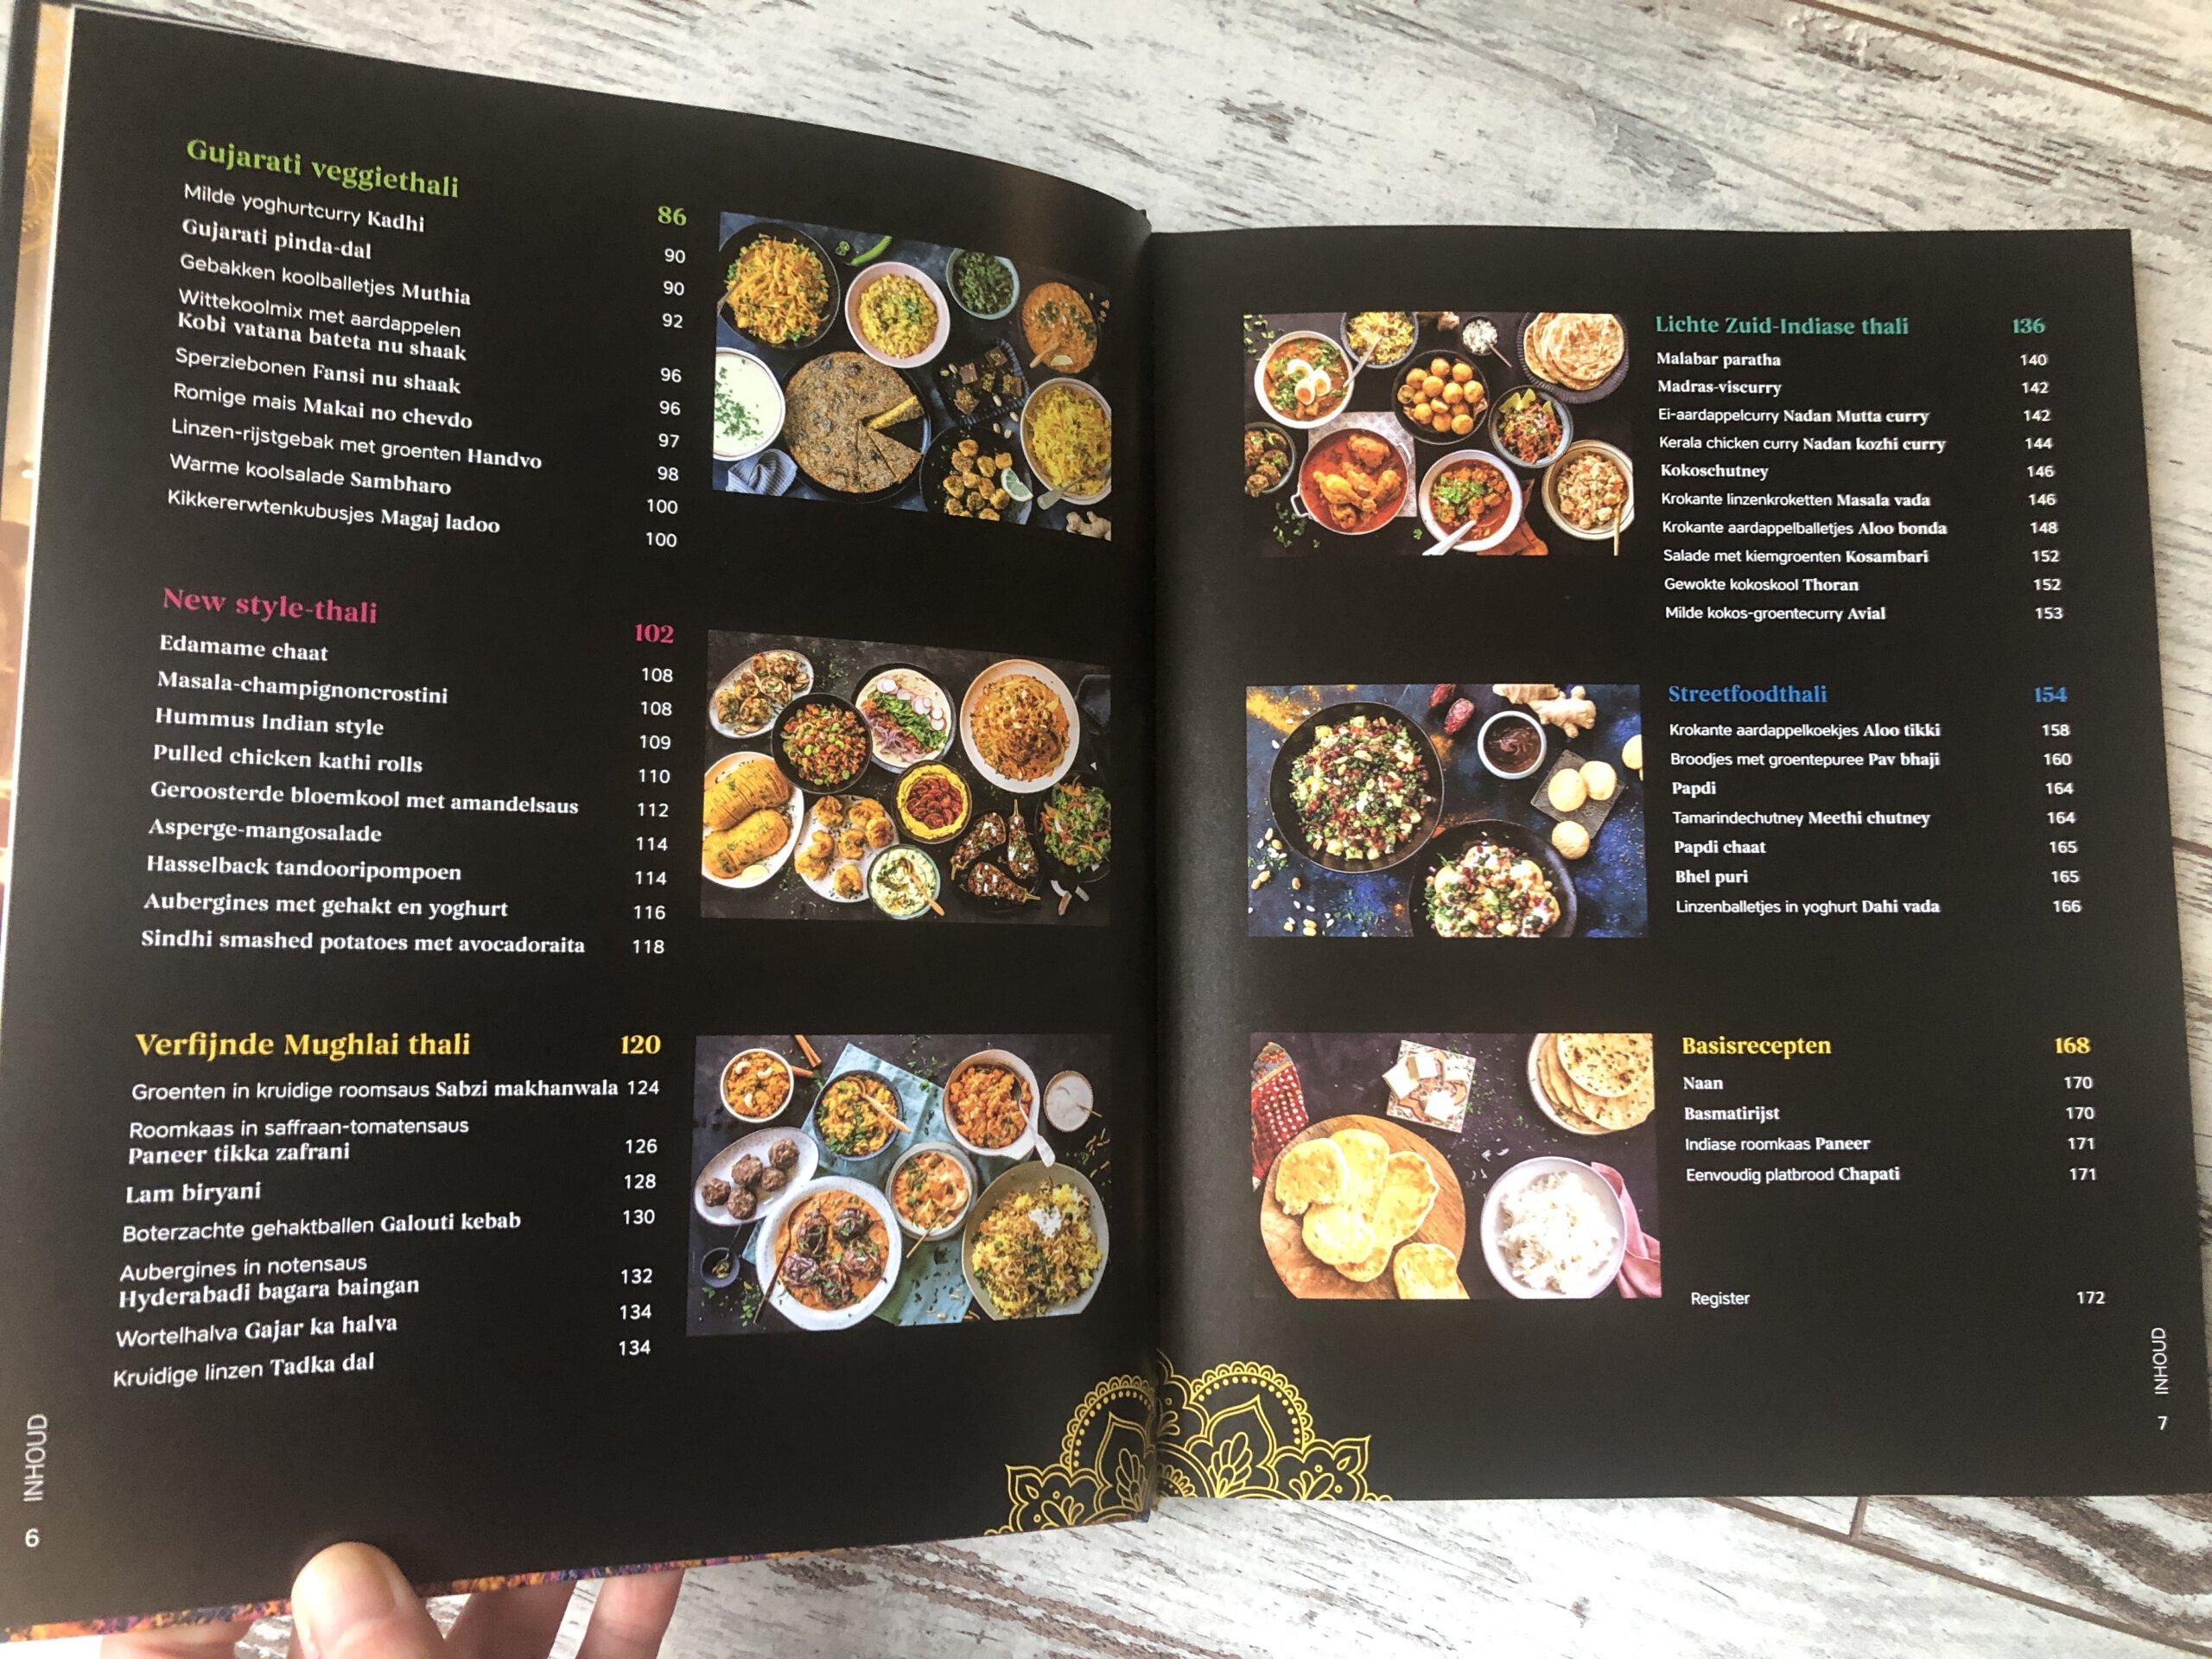 Inhoudsopgave kookboek Thali